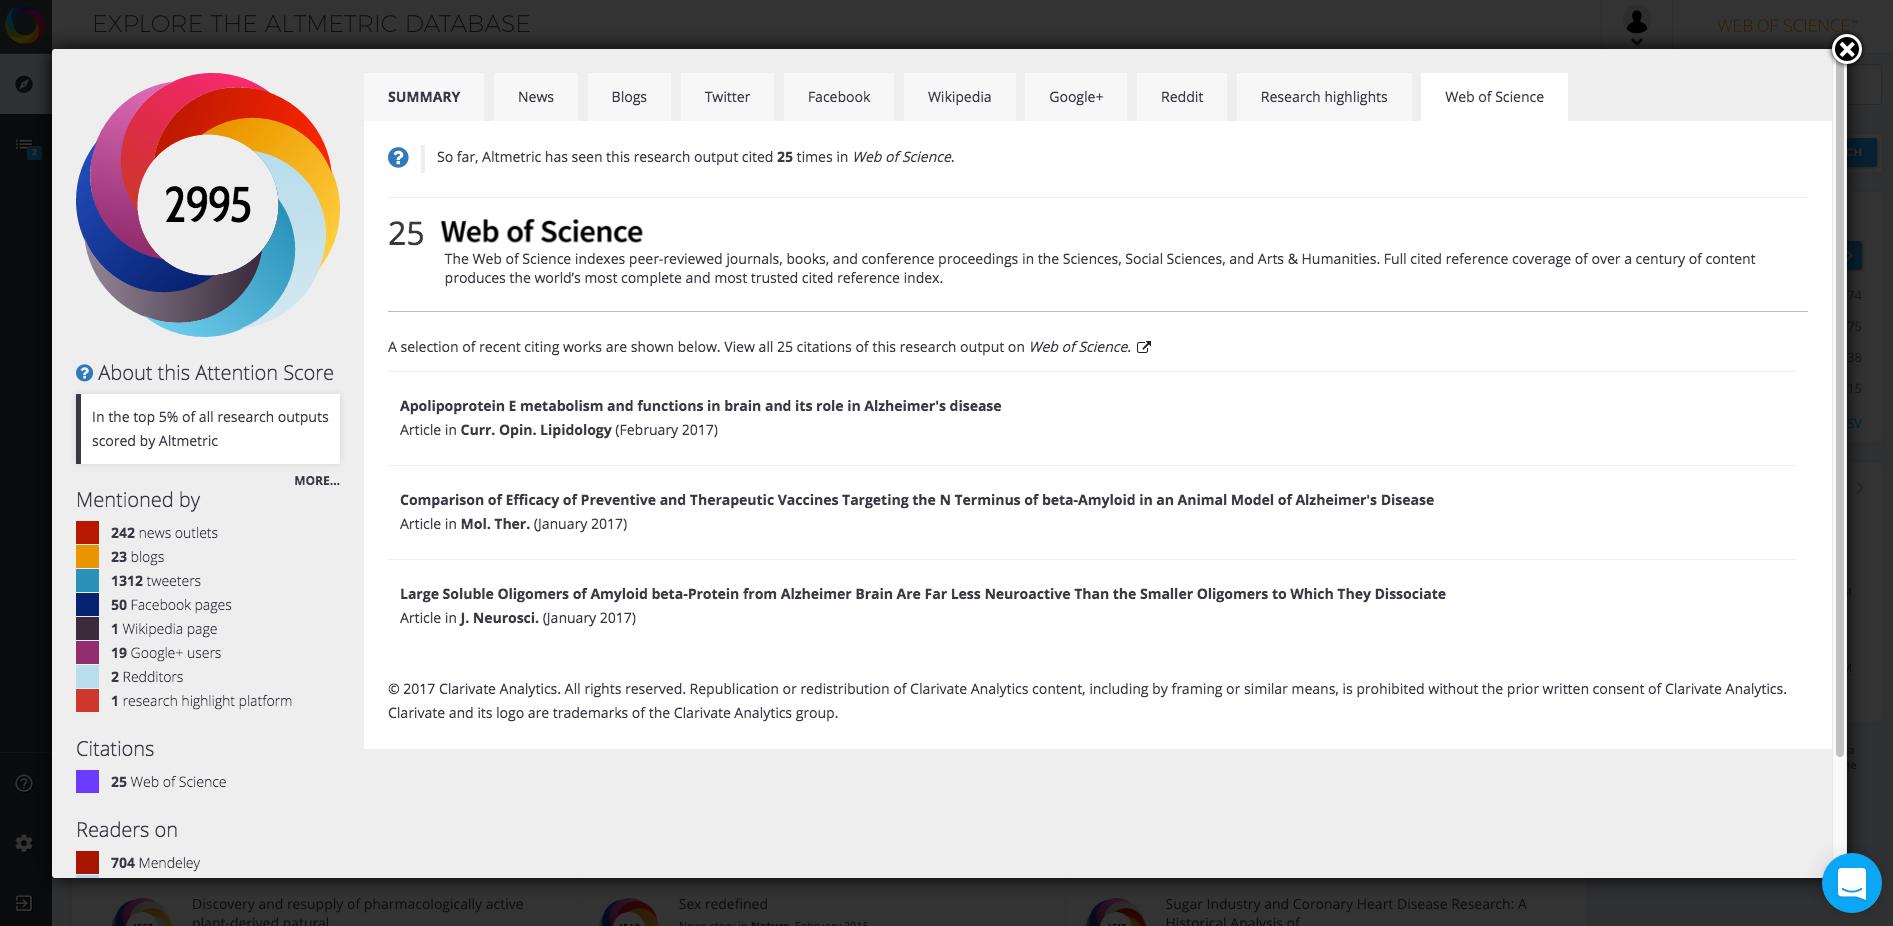 Web of Science - Press Release Screenshot